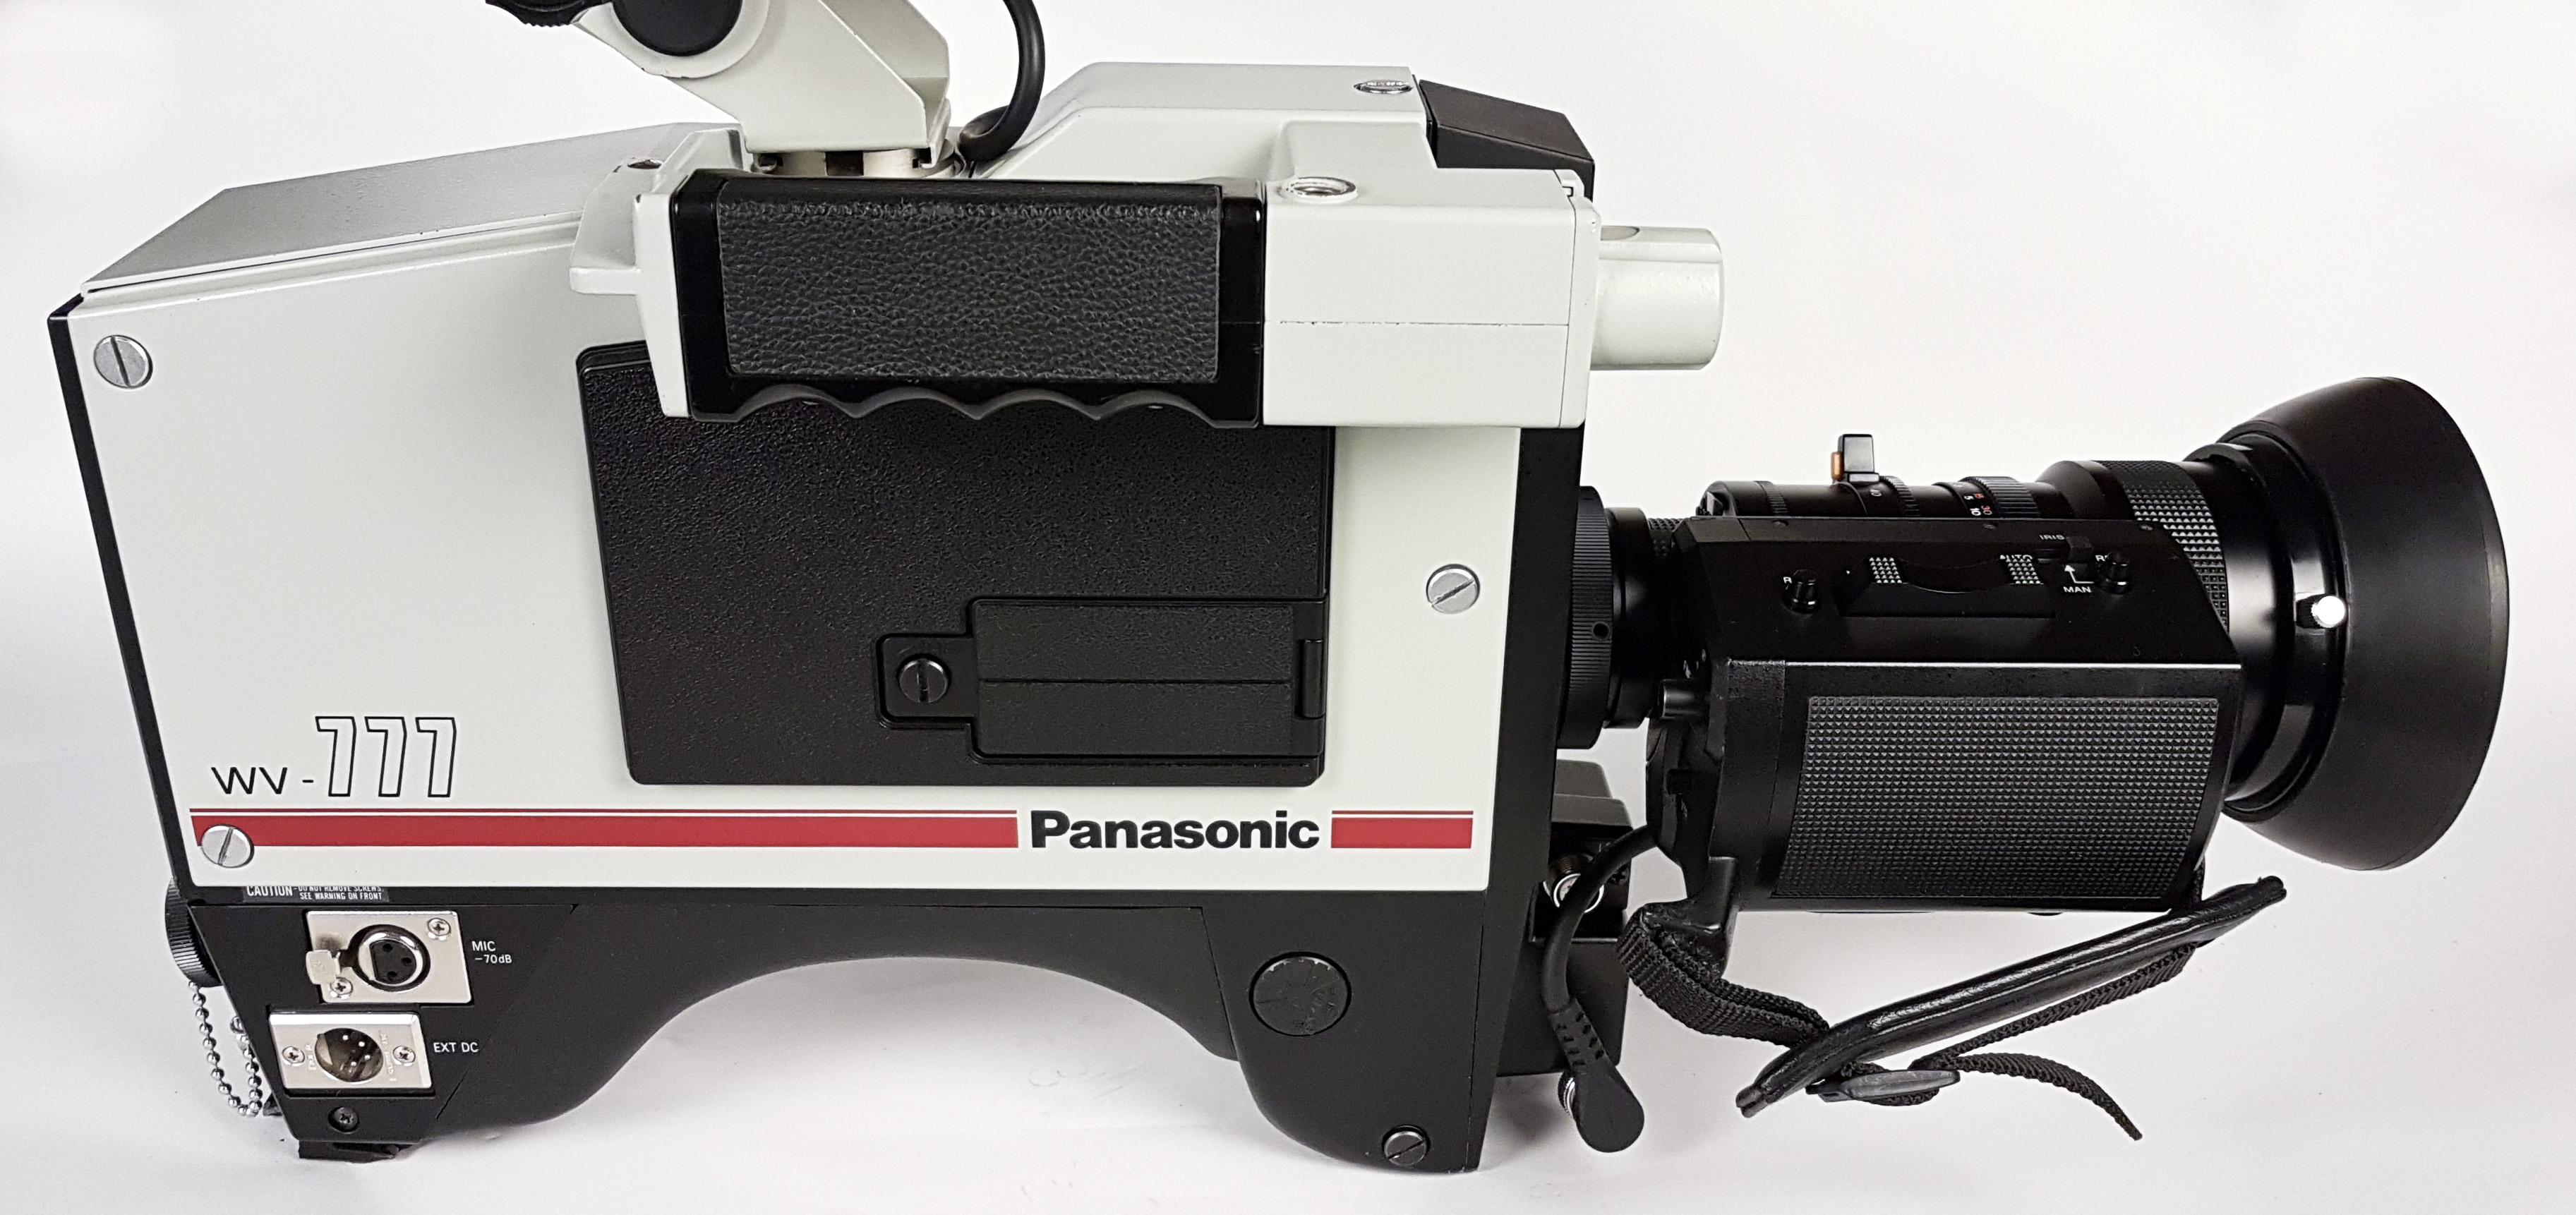 Panasonic WV-777 large viewfinder -  (4 von 6)